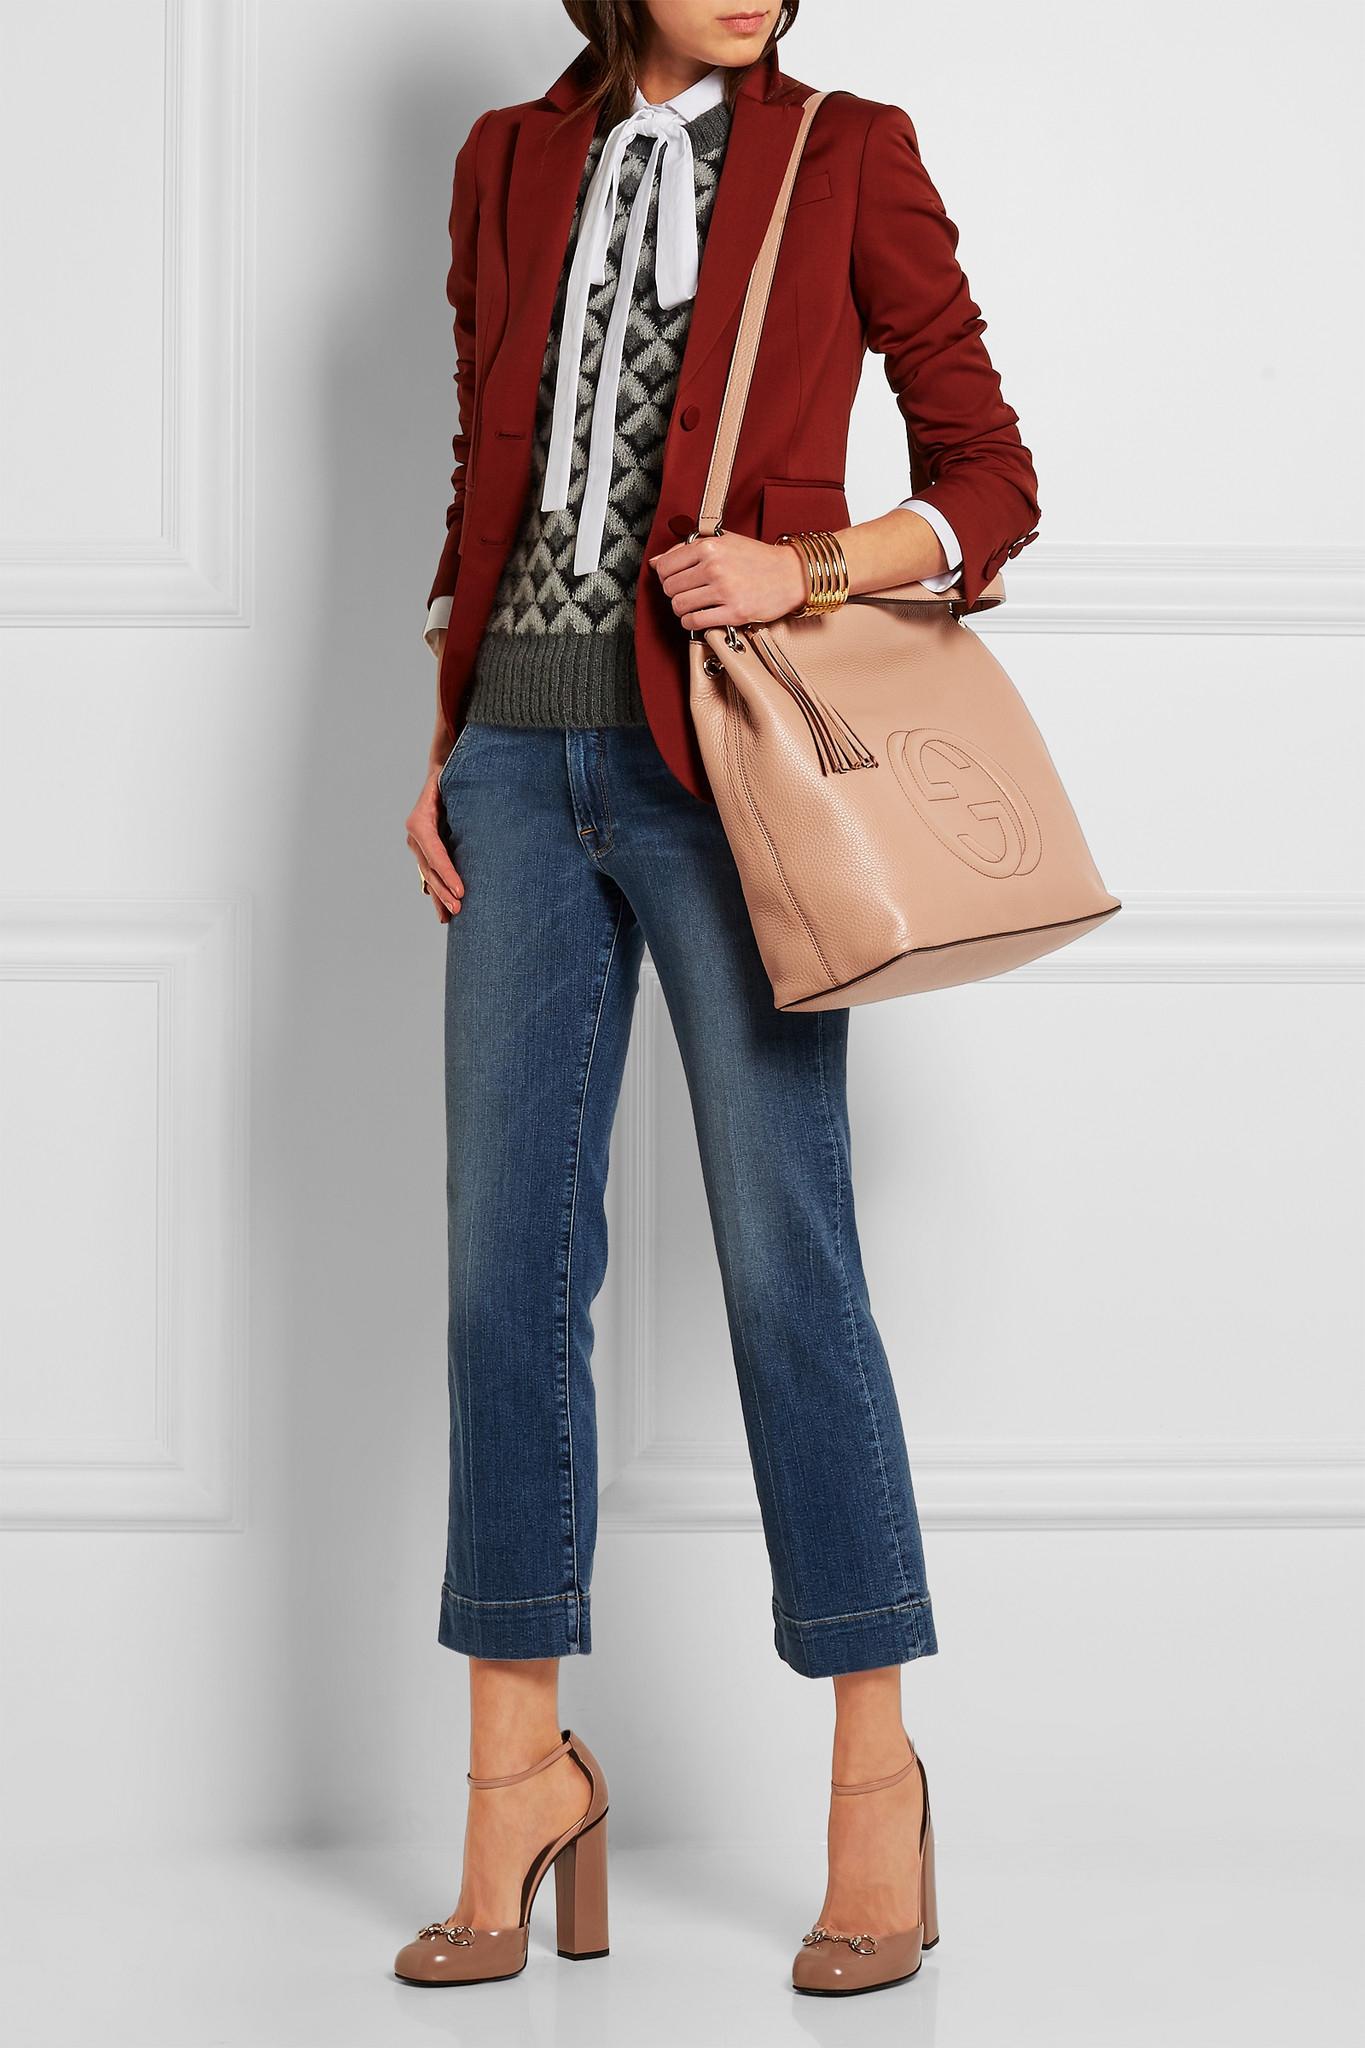 c58023886 Gucci Soho Hobo Large Textured-leather Shoulder Bag - Lyst